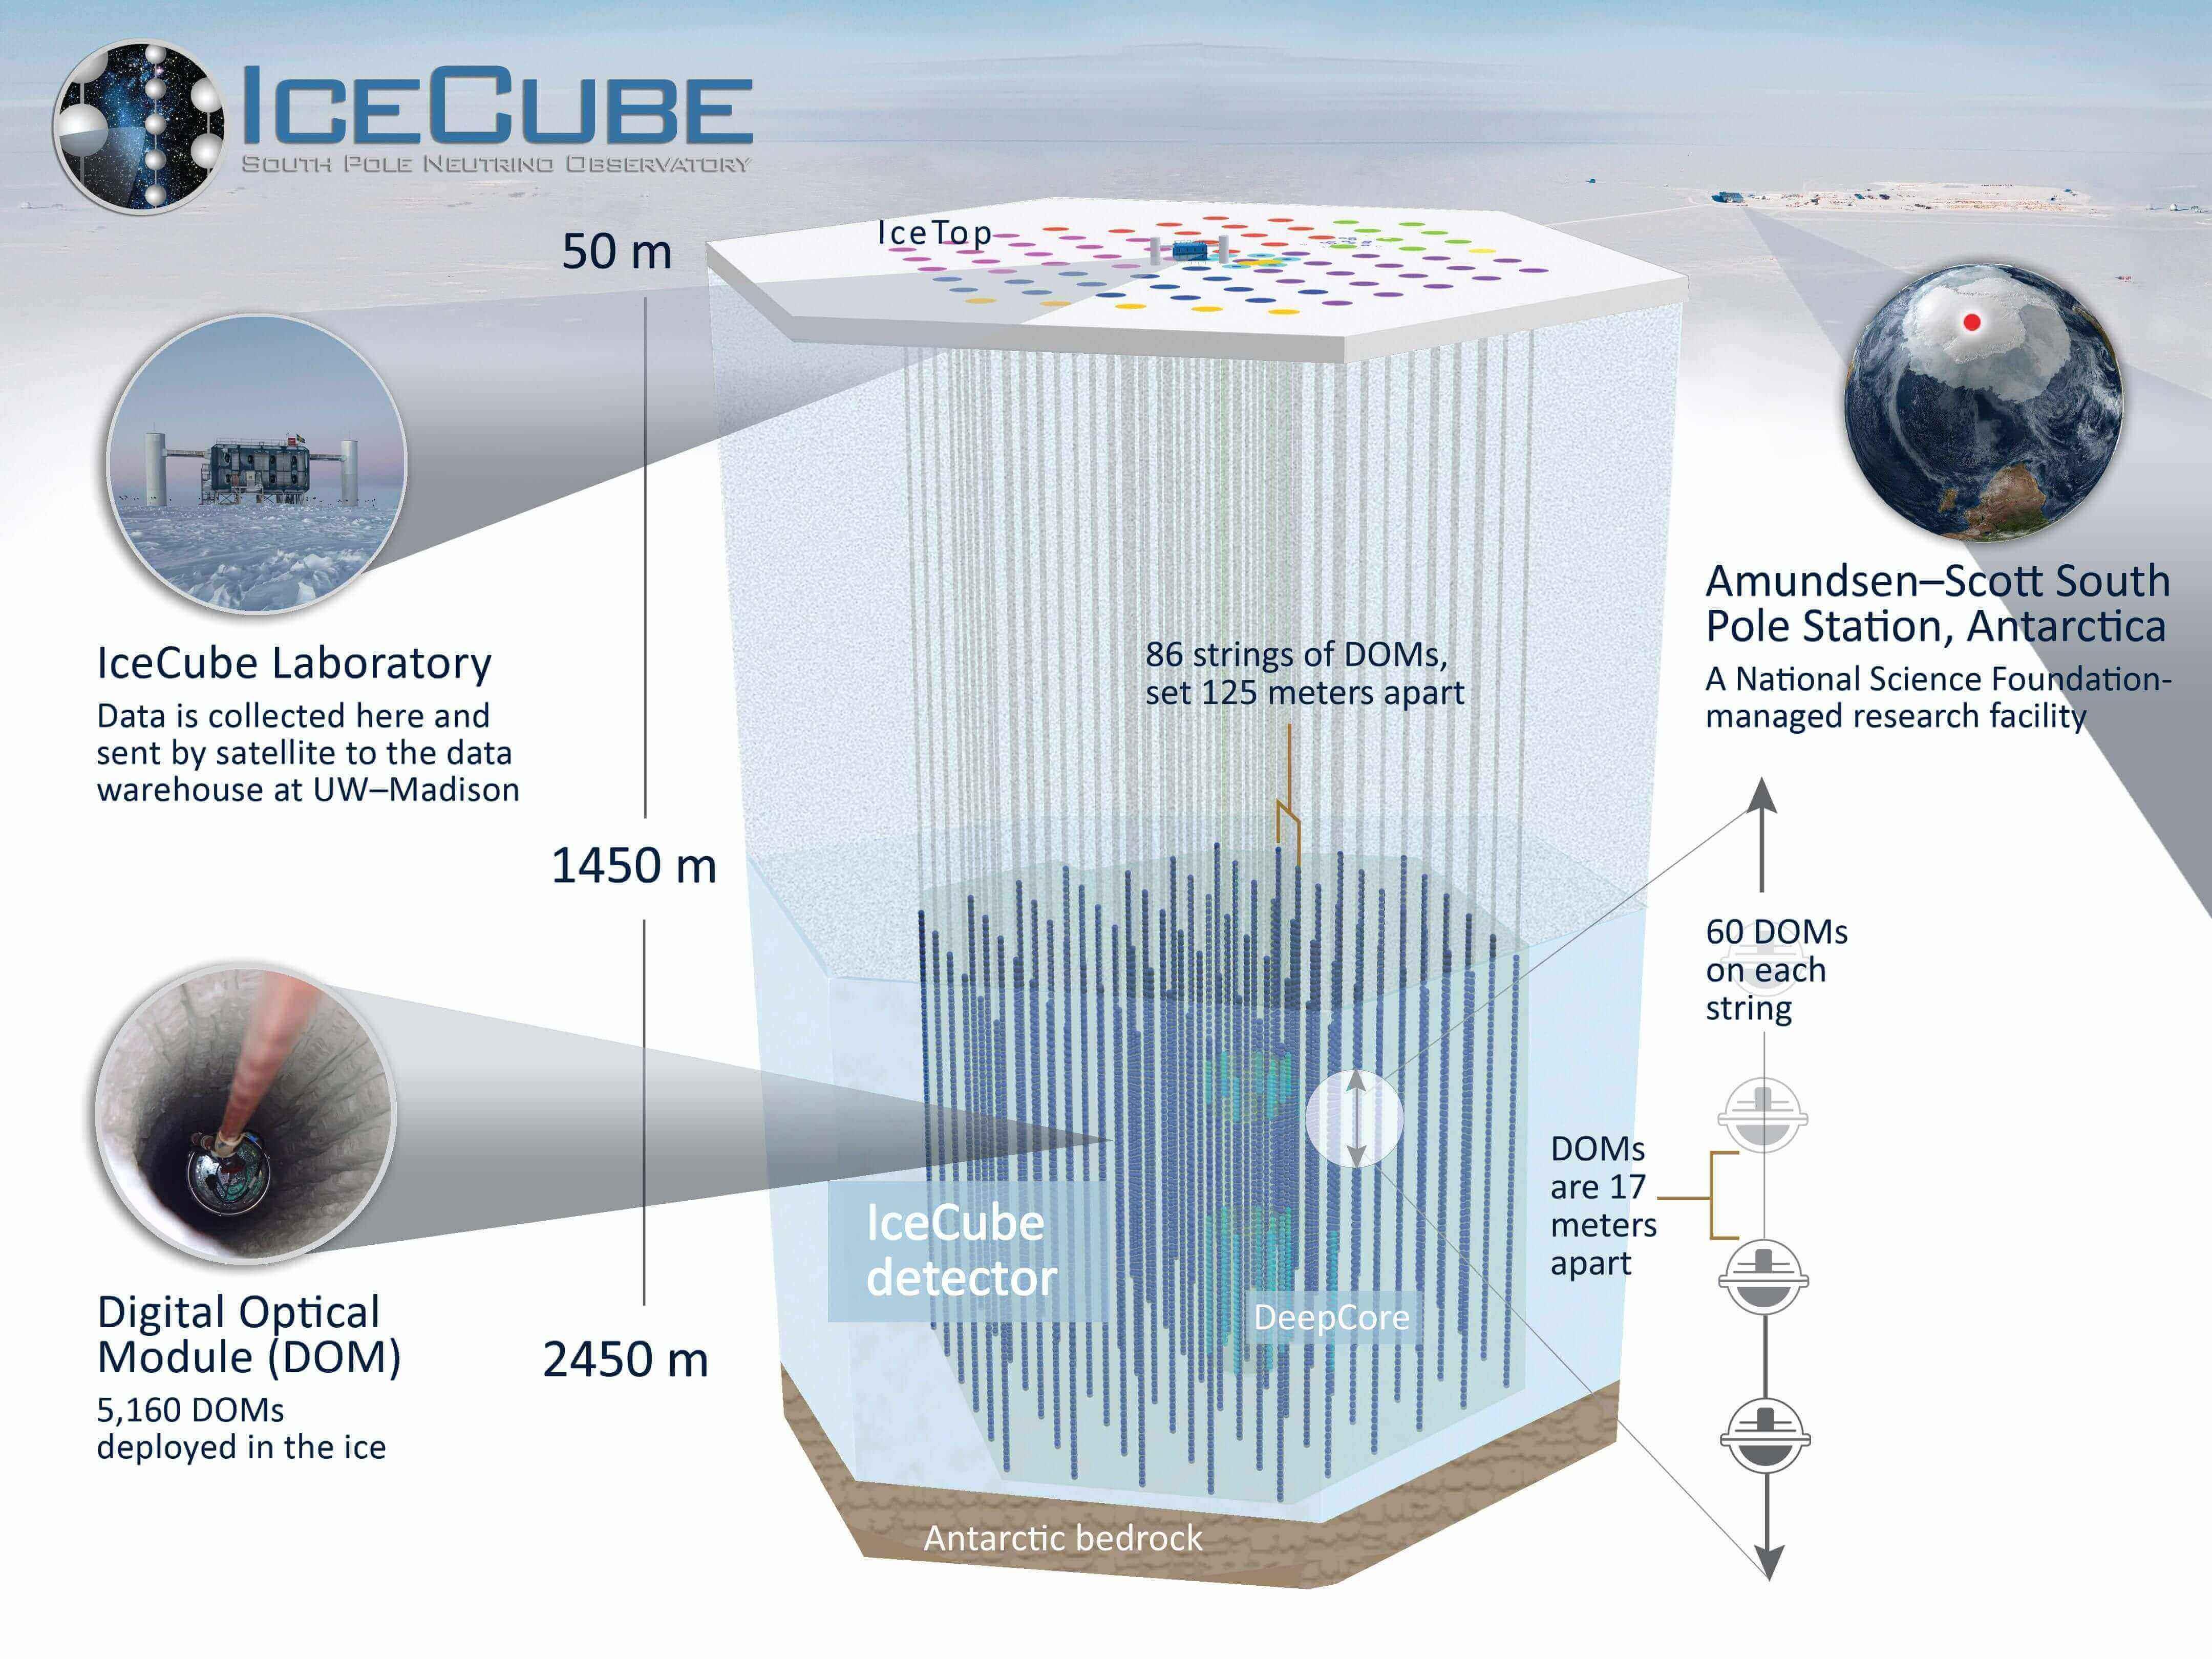 Feds renew big IceCube Observatory contract with UW-Madison Icecube Neutrino Observatory